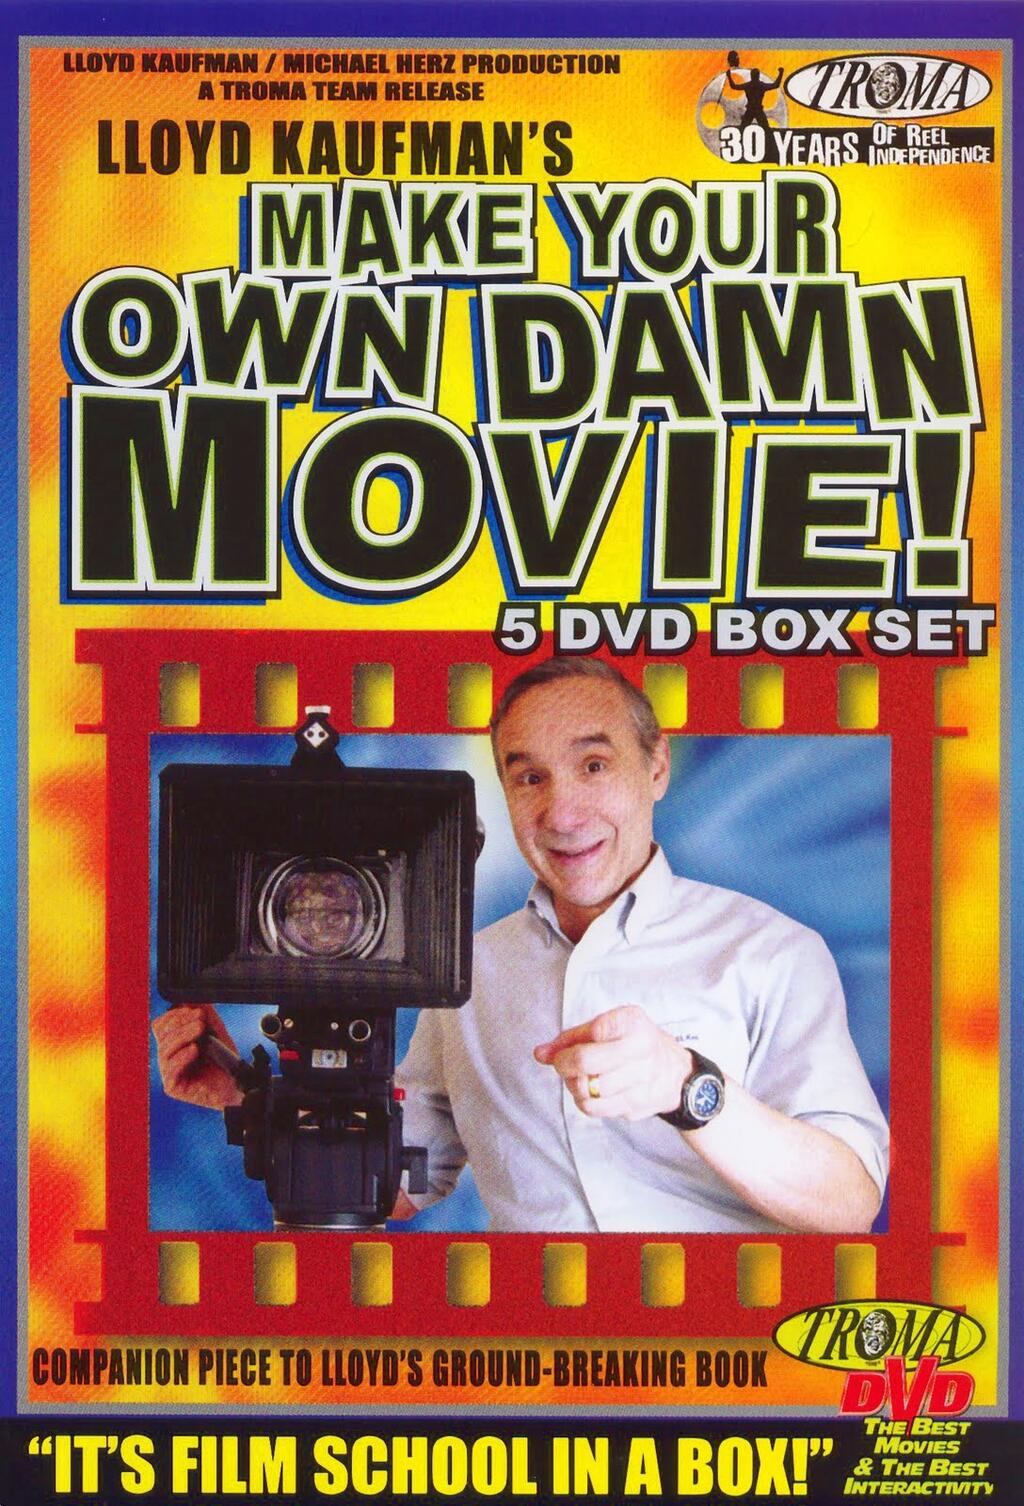 Make Your Own Damn Movie!